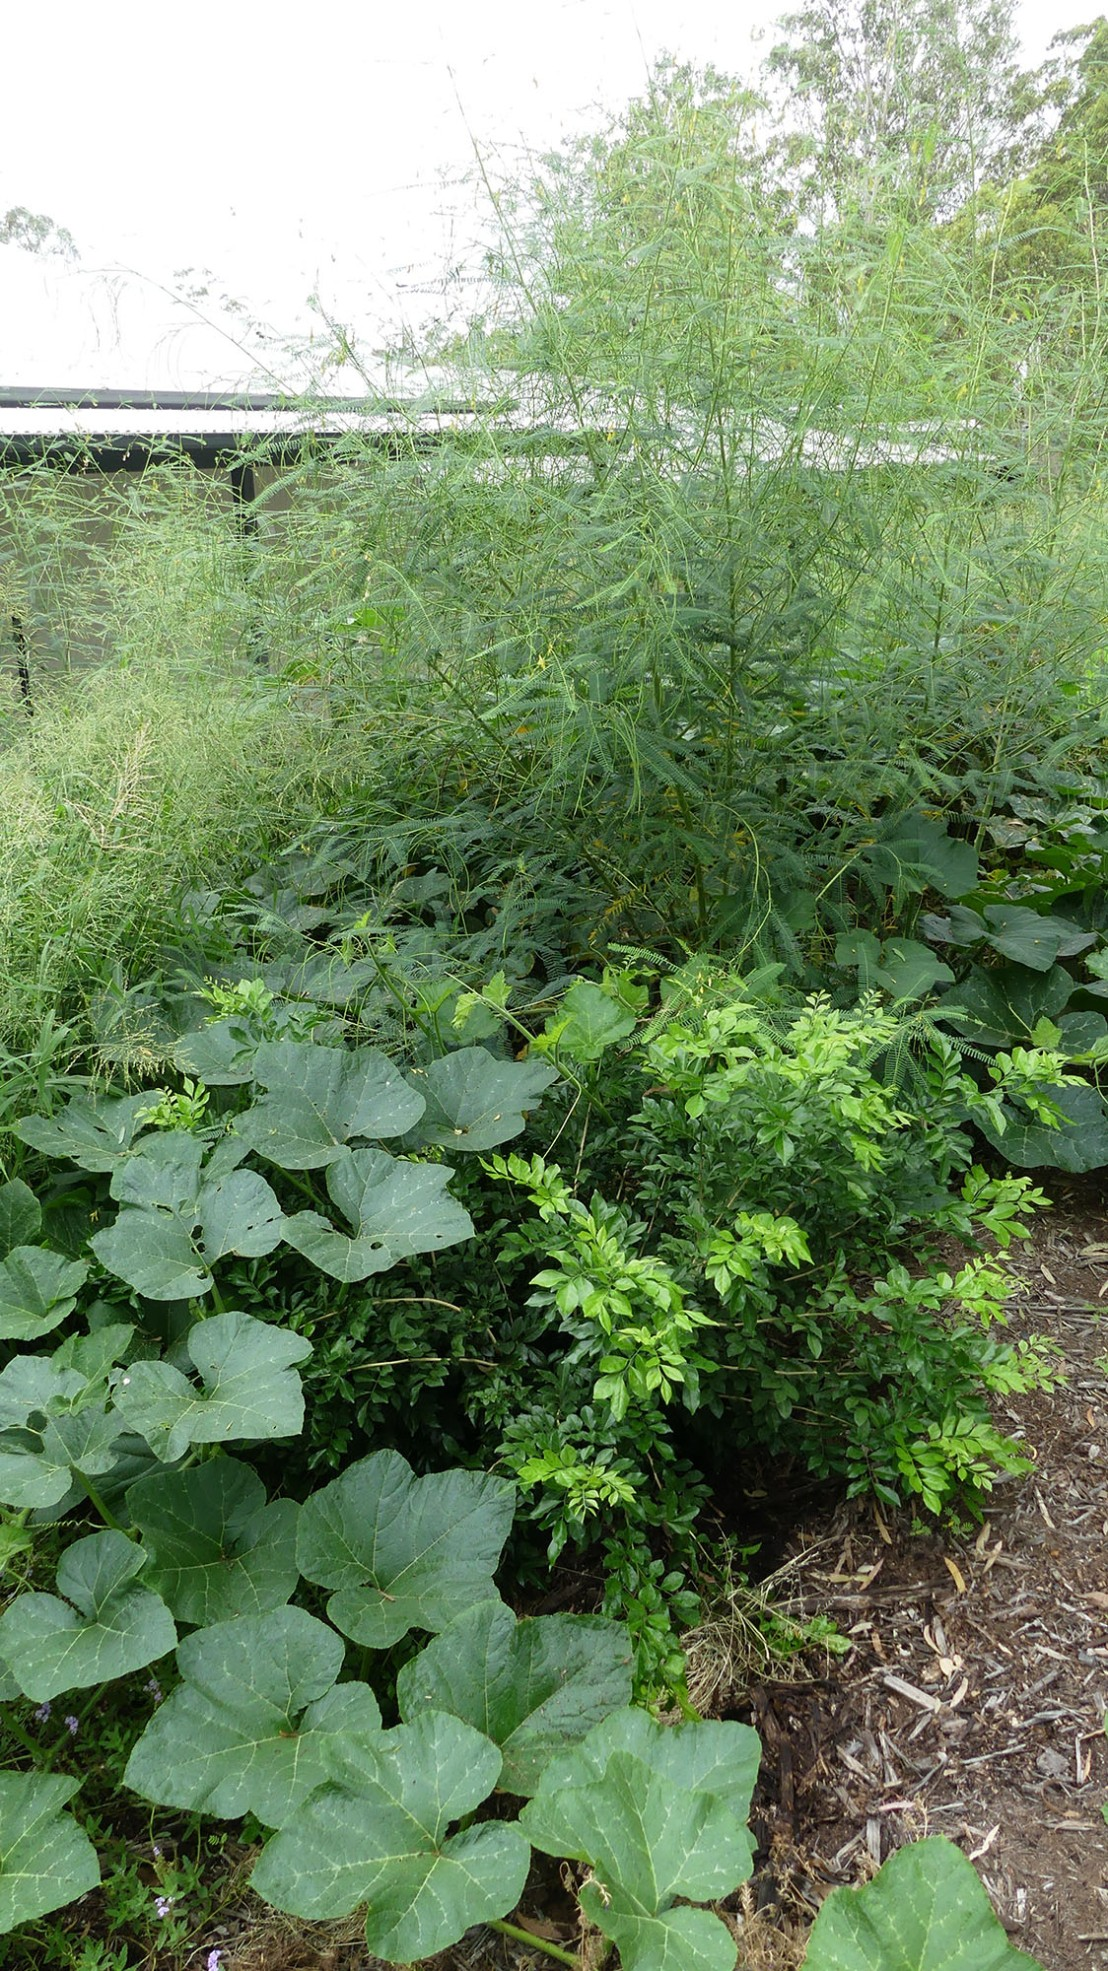 Garden flourishing after rain.